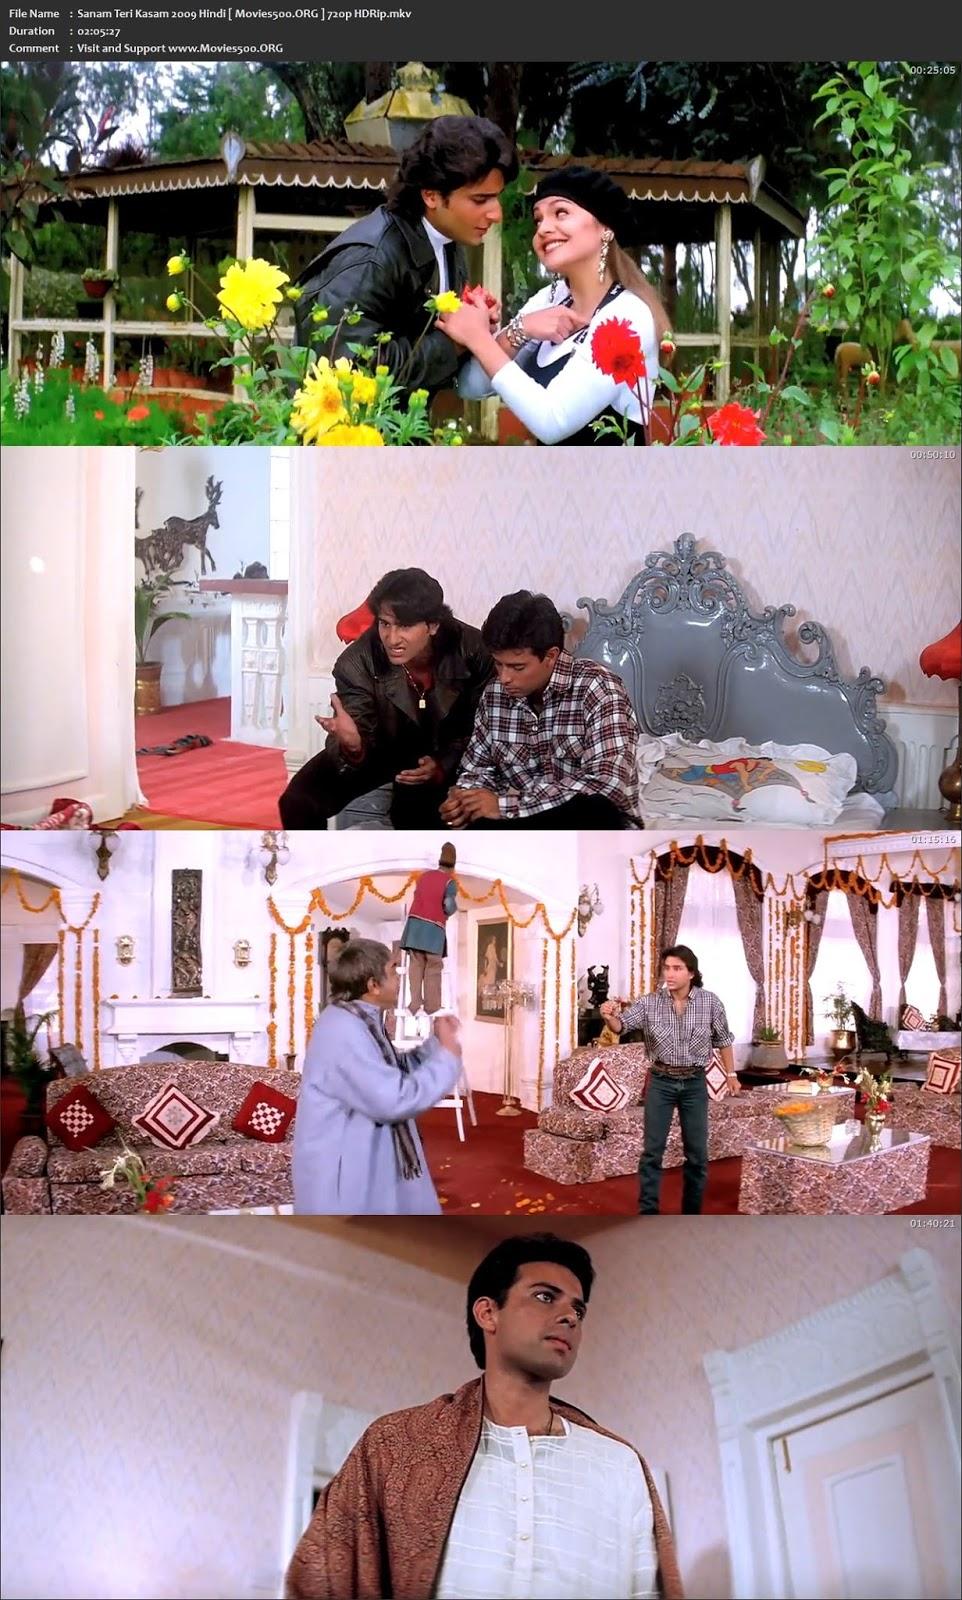 Sanam Teri Kasam 2009 Hindi Full Movie HDRip 720p at movies500.site